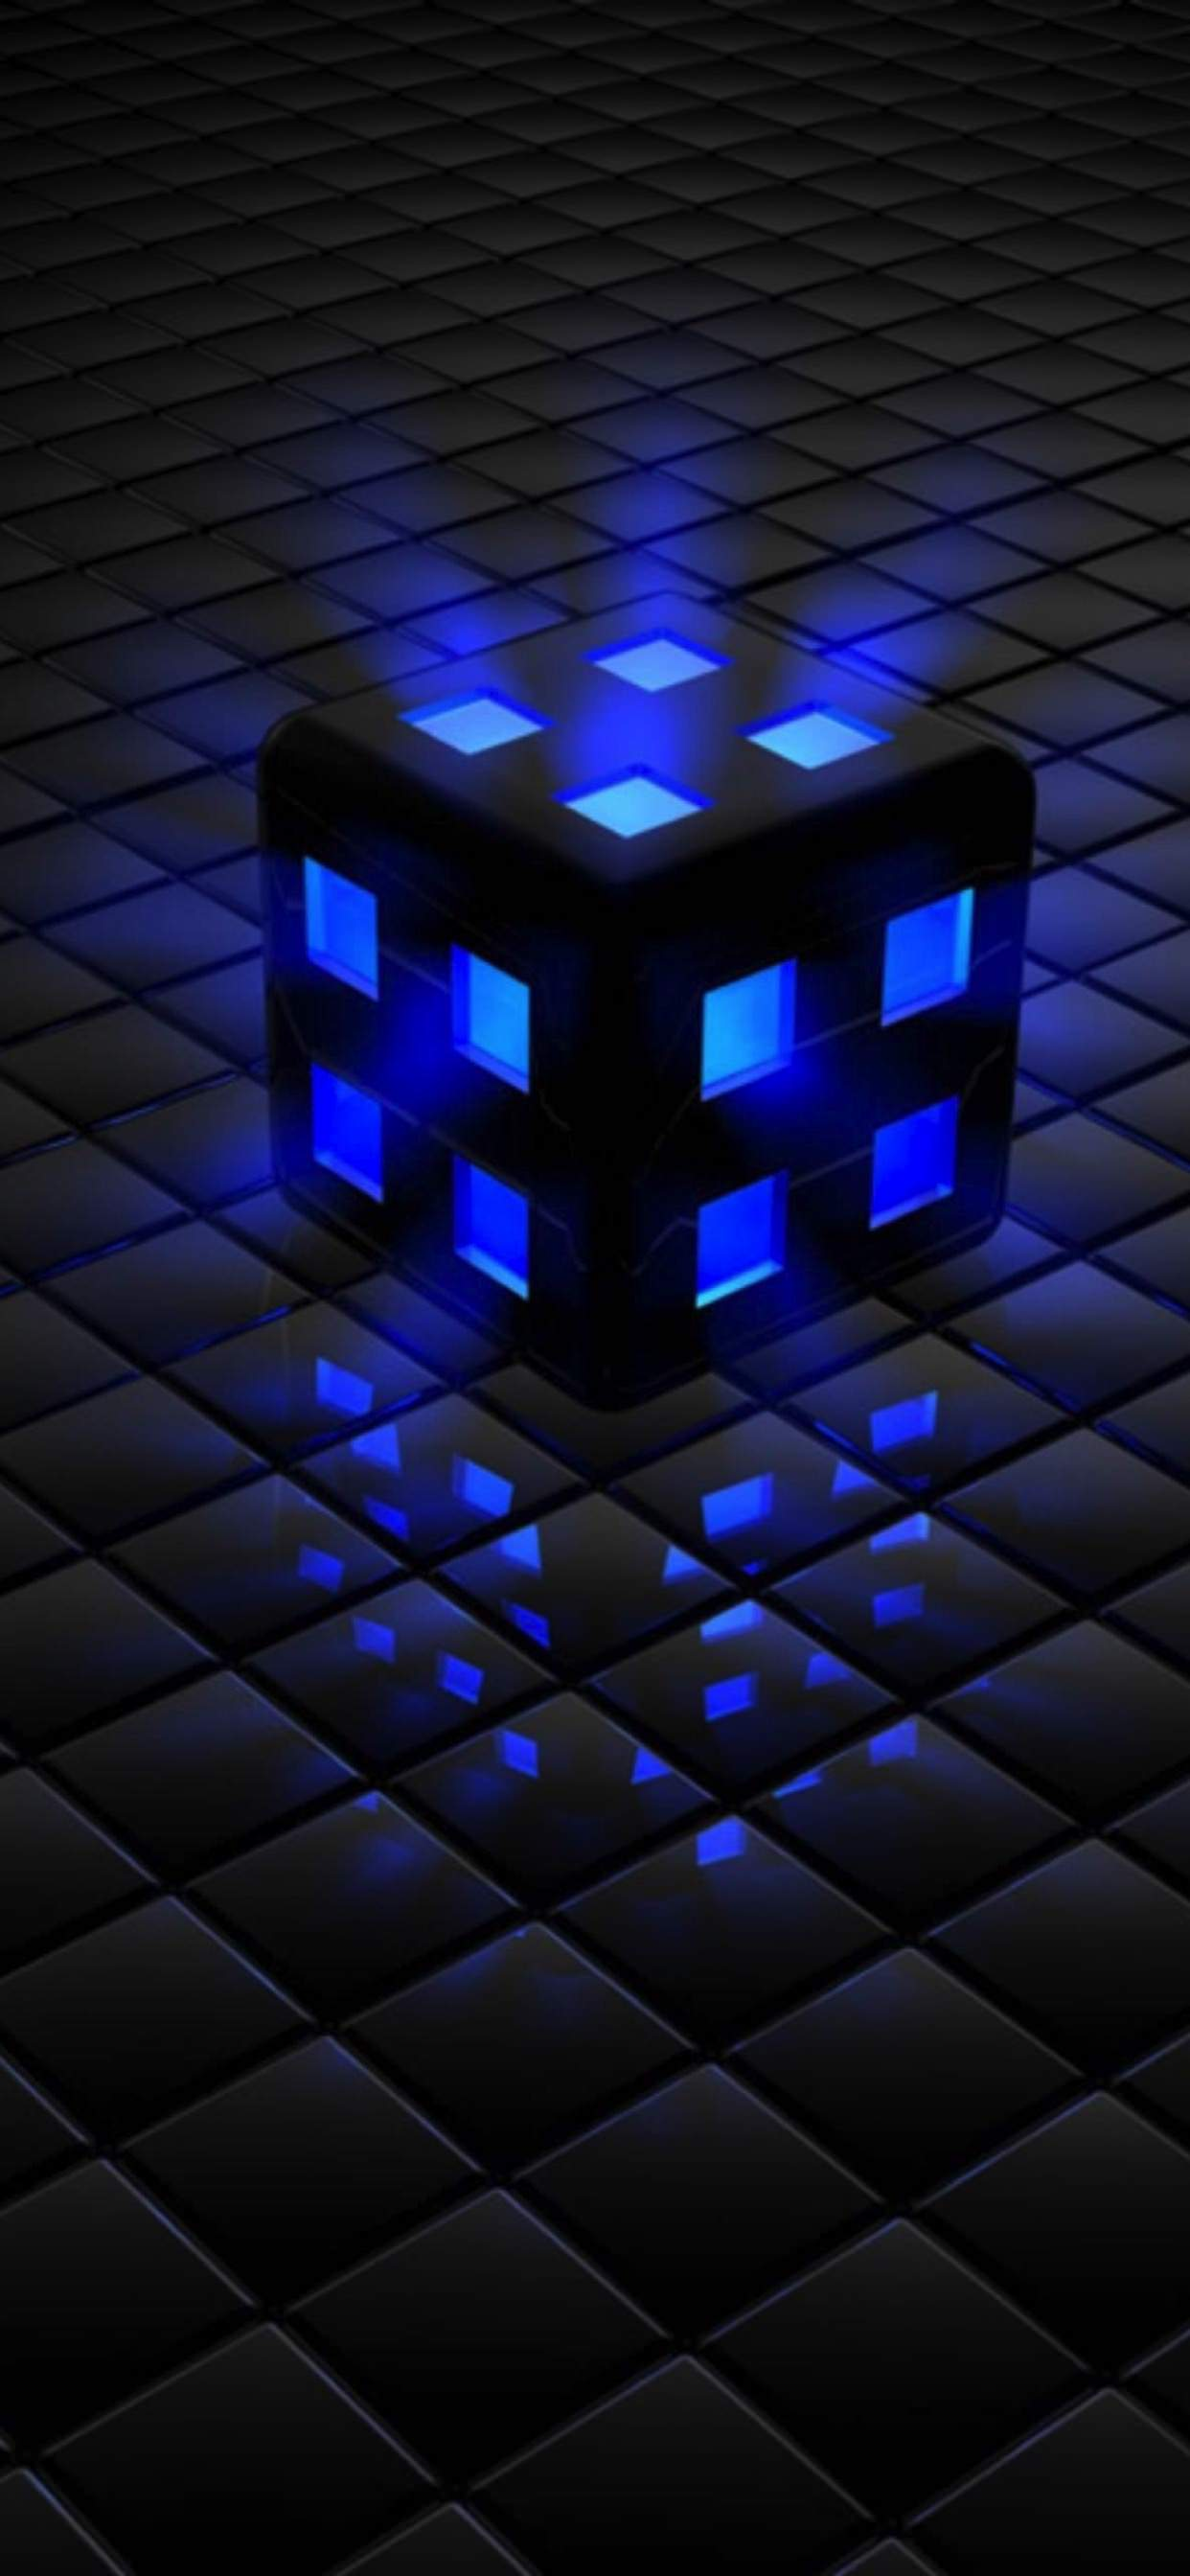 Unduh 4000+ Wallpaper Black Electric Blue HD Paling Keren